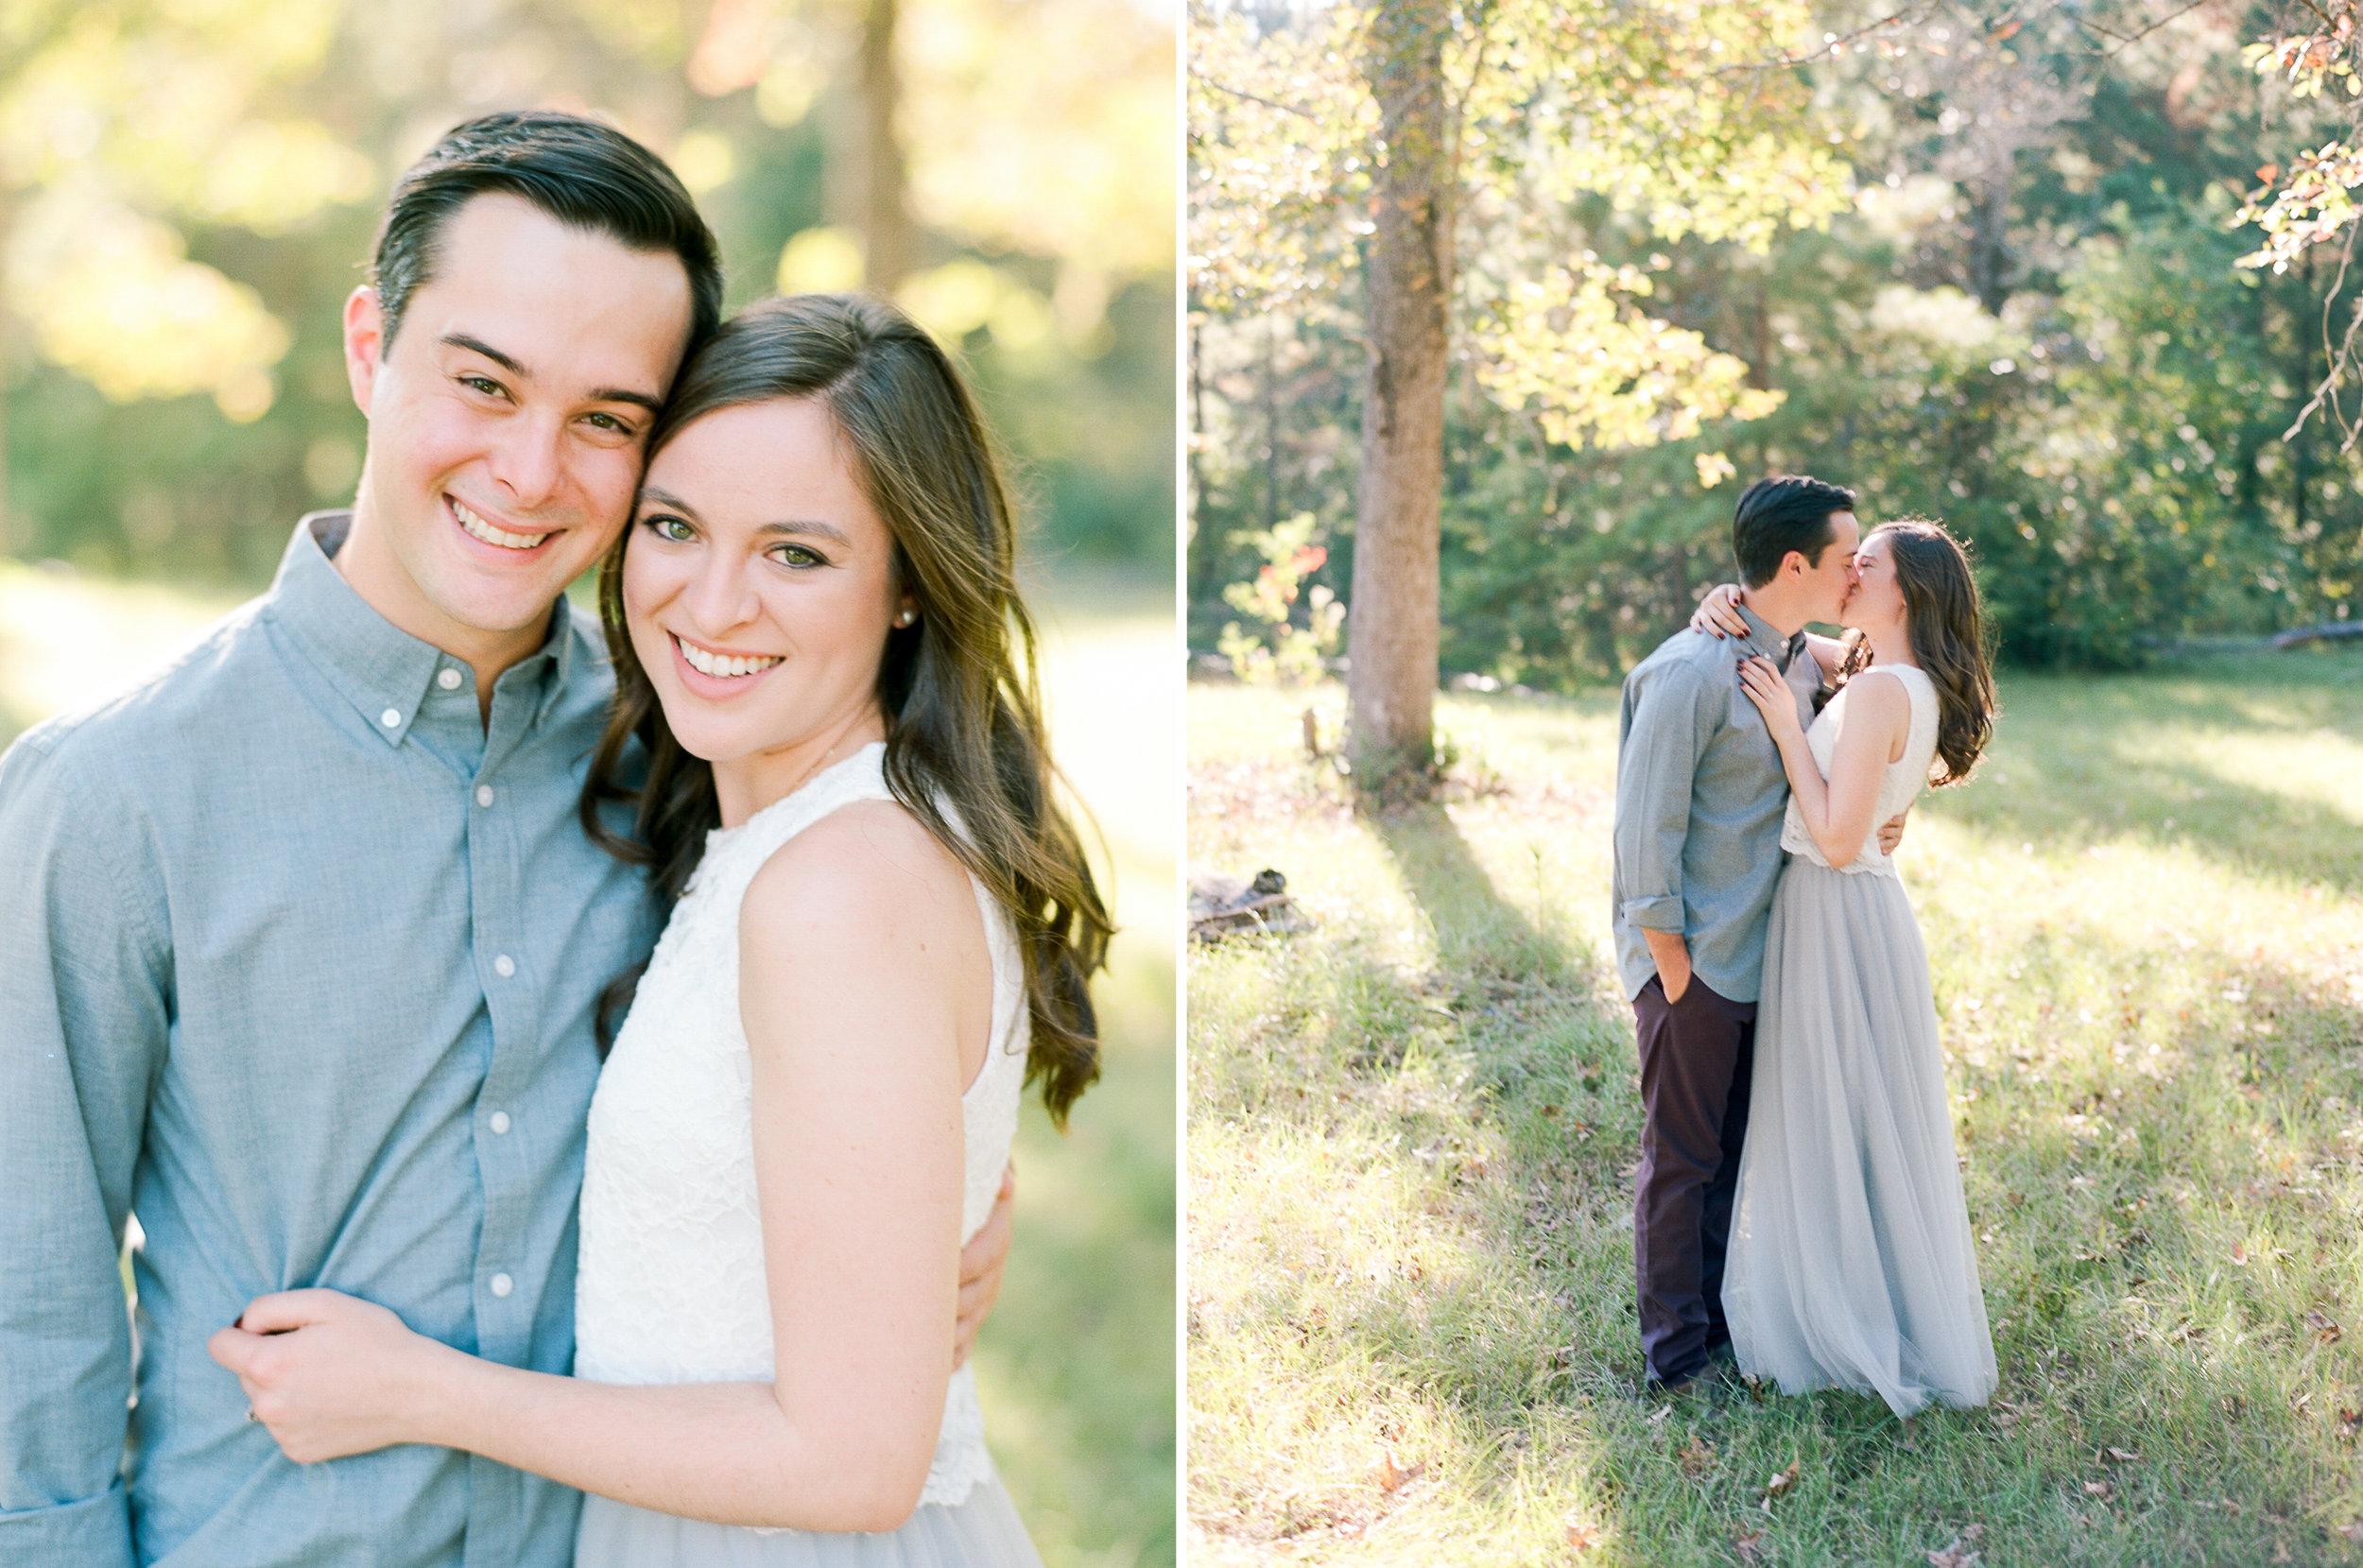 houston-wedding-photographer-college-station-austin-the-woodlands-film-photography-style-me-pretty-engagements-dana-fernandez-photography-101.jpg